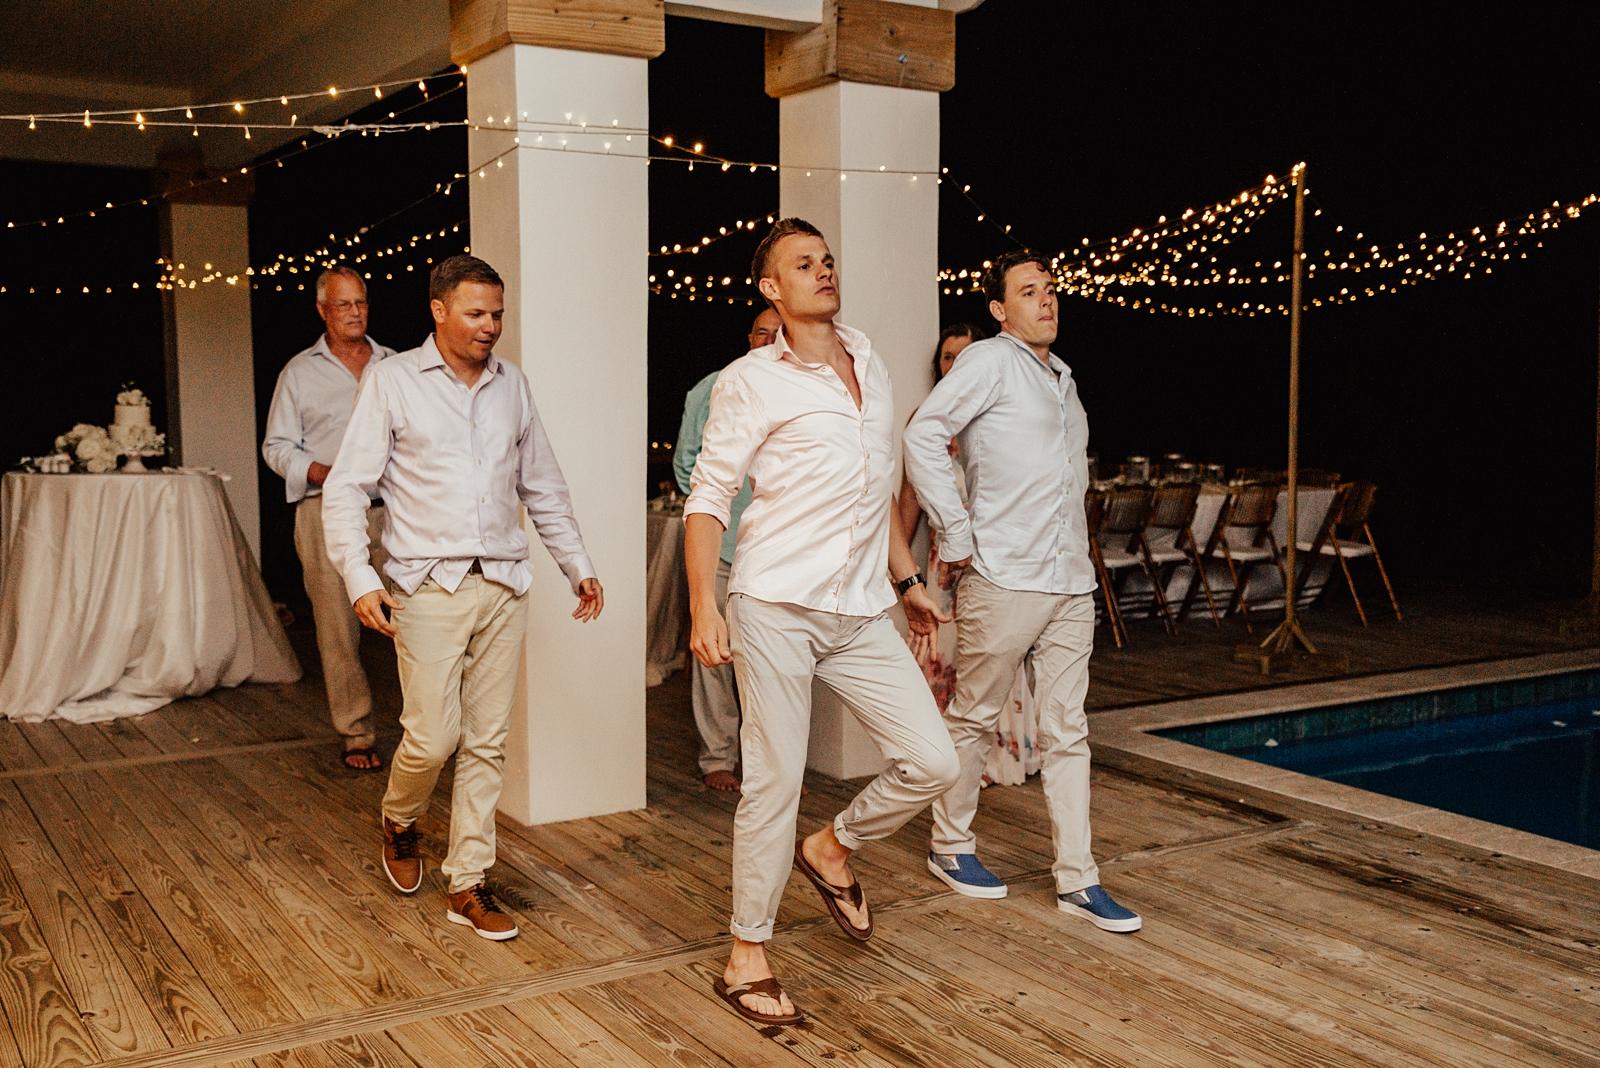 Jenni & Andrew Intimate Beach Destination Wedding in Little Exuma, Bahamas_0546.jpg